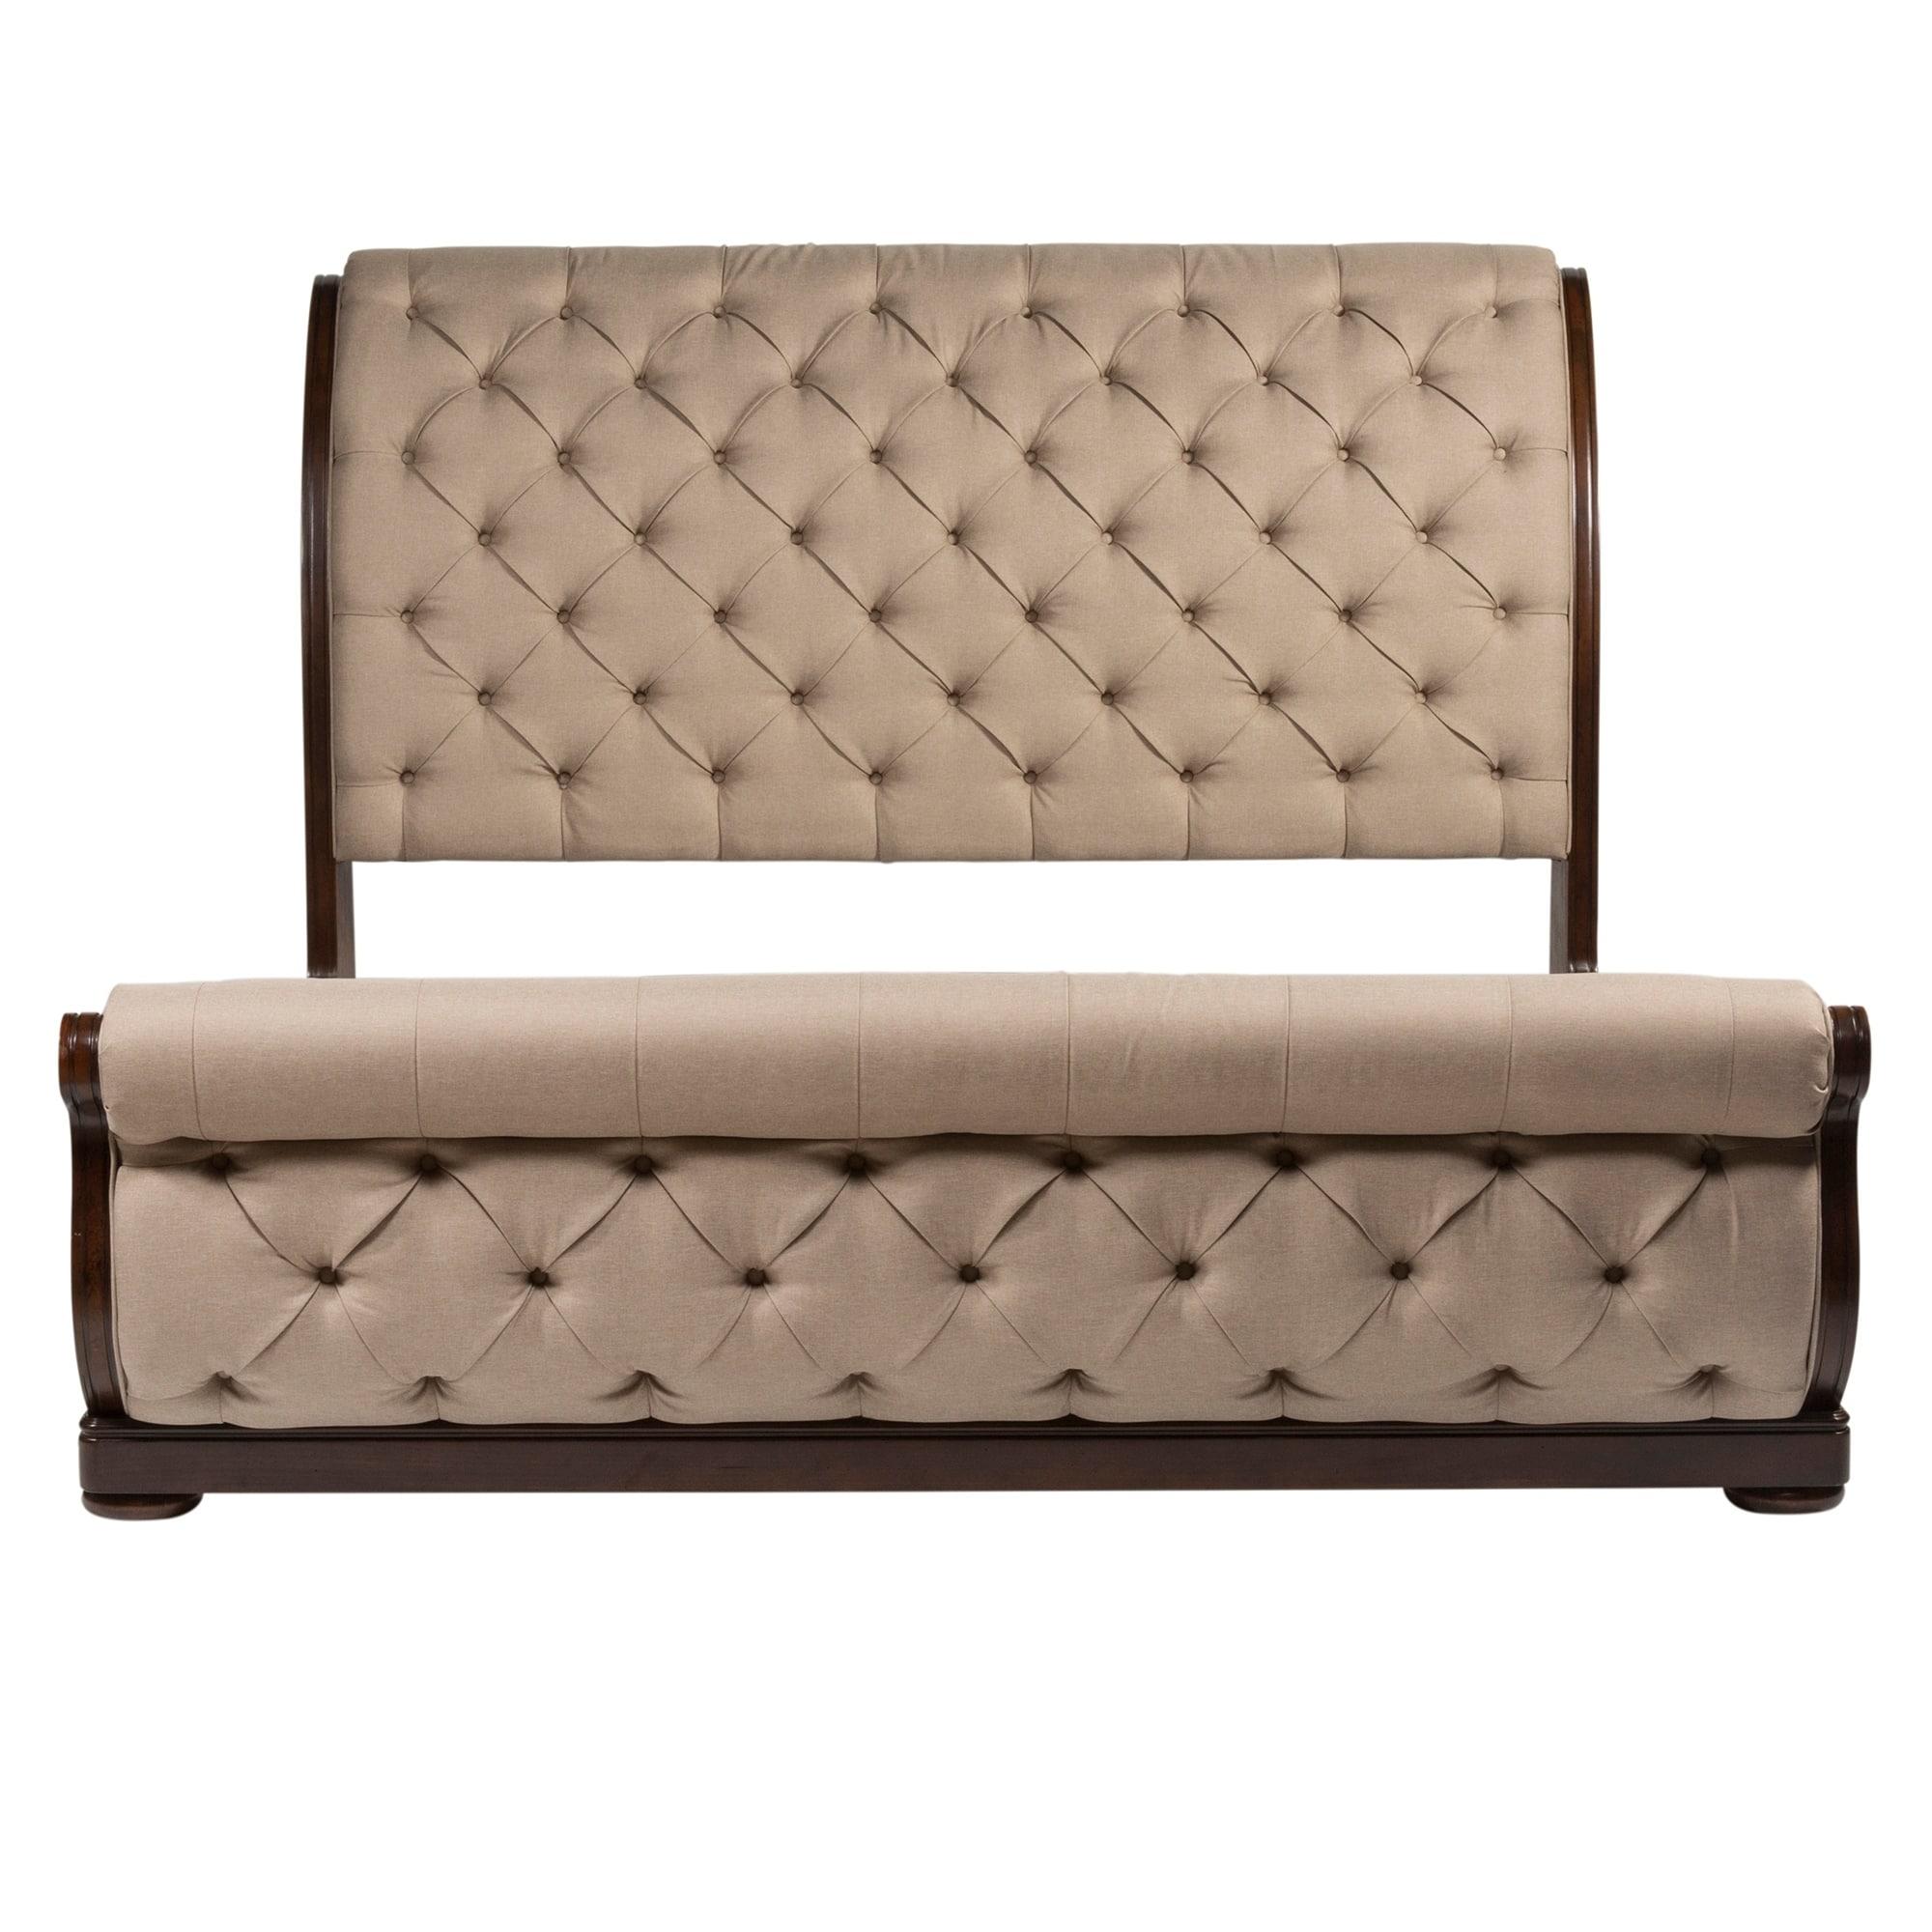 Buy Beds Online At Overstock